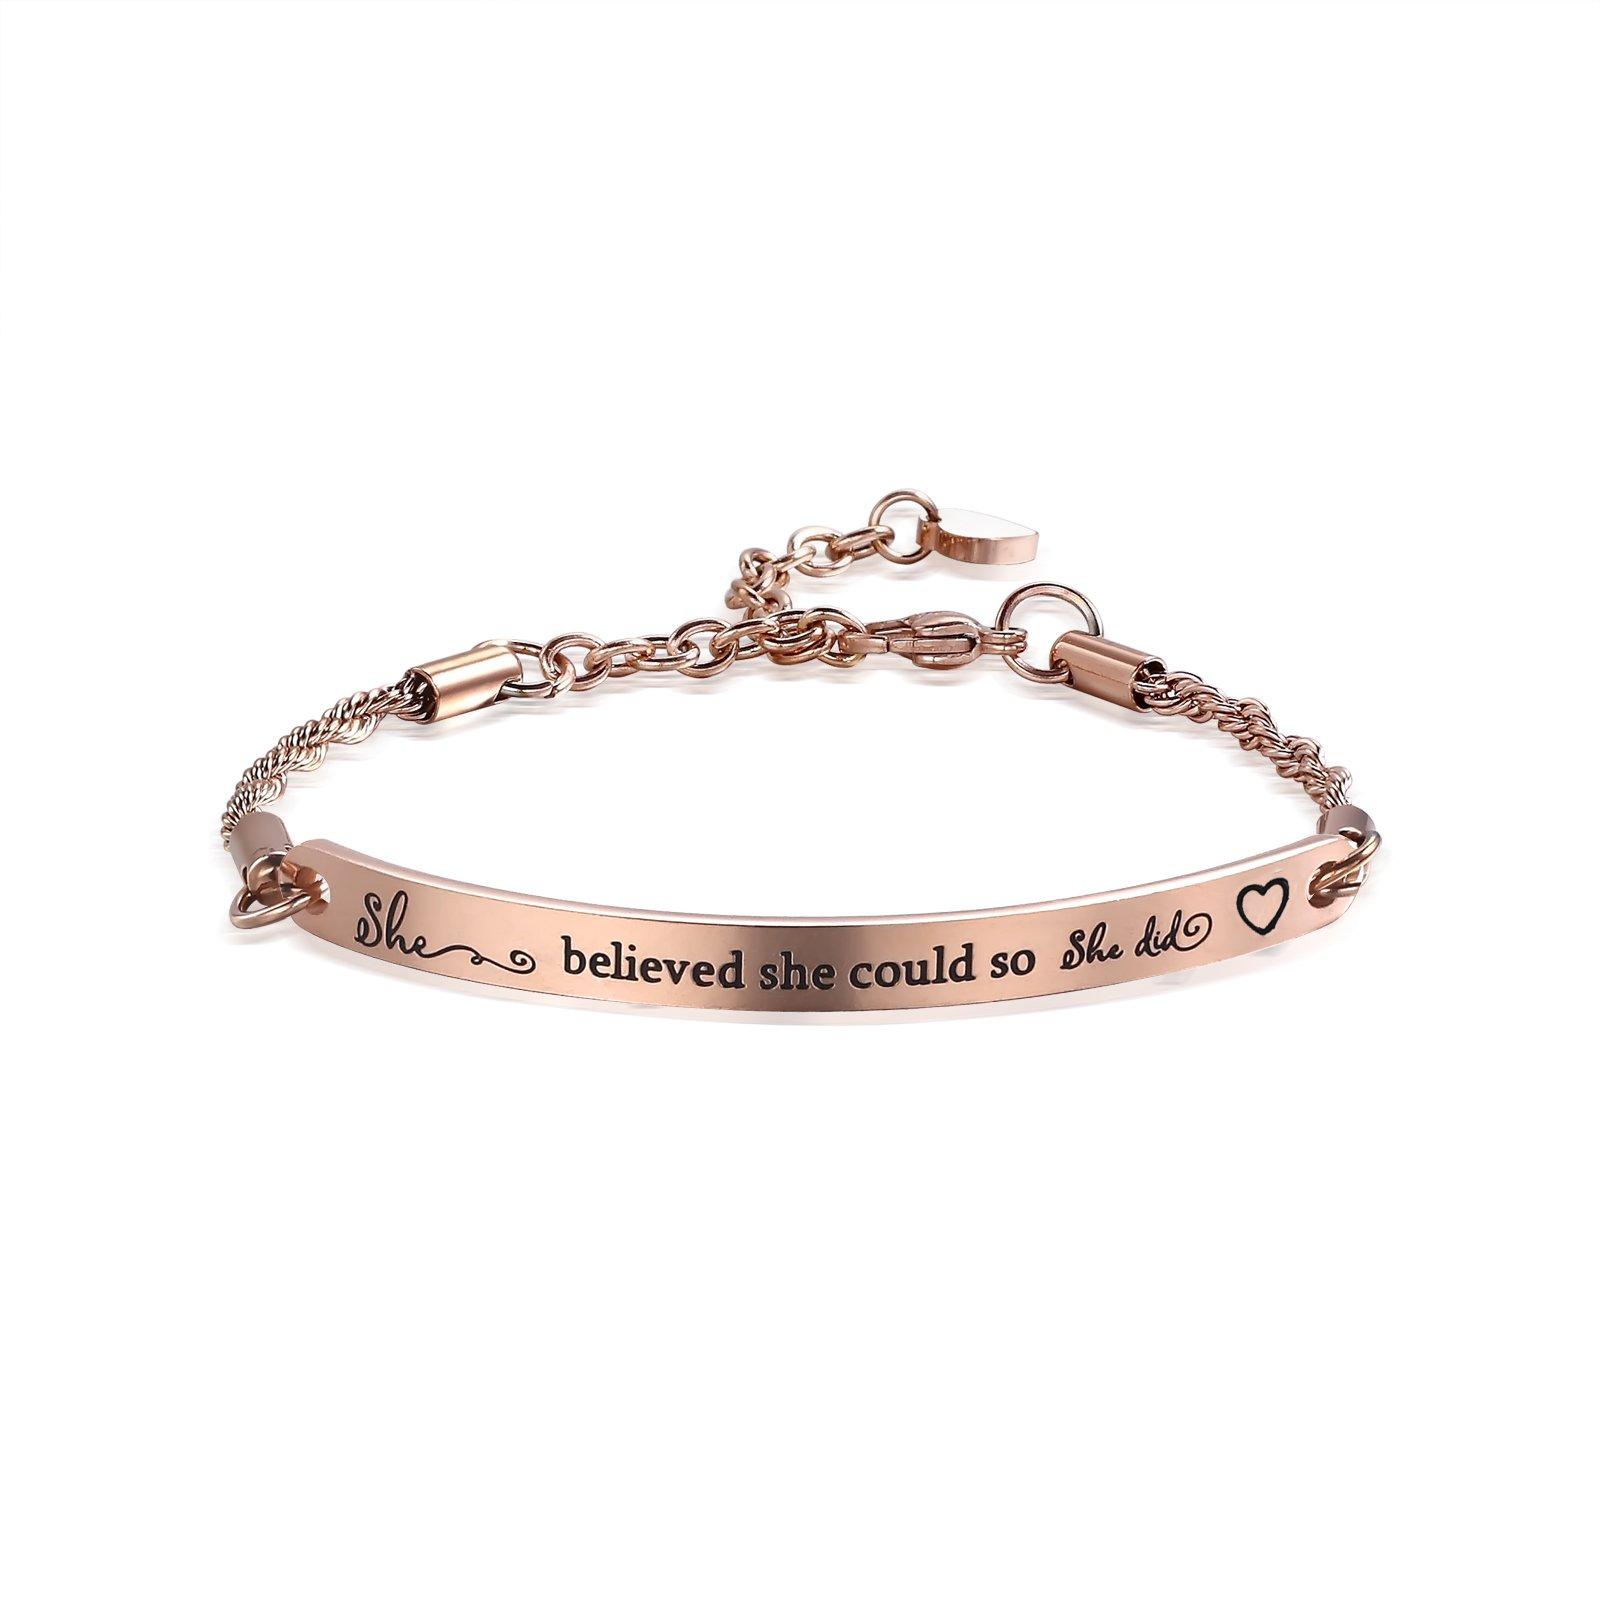 ivyAnan Inspirational Engraved Bracelet''She believed she could so she did'' Quote Bar Bracelet for women, girls, friendship, gift jewlery (Rose Gold-She Believed She Could)